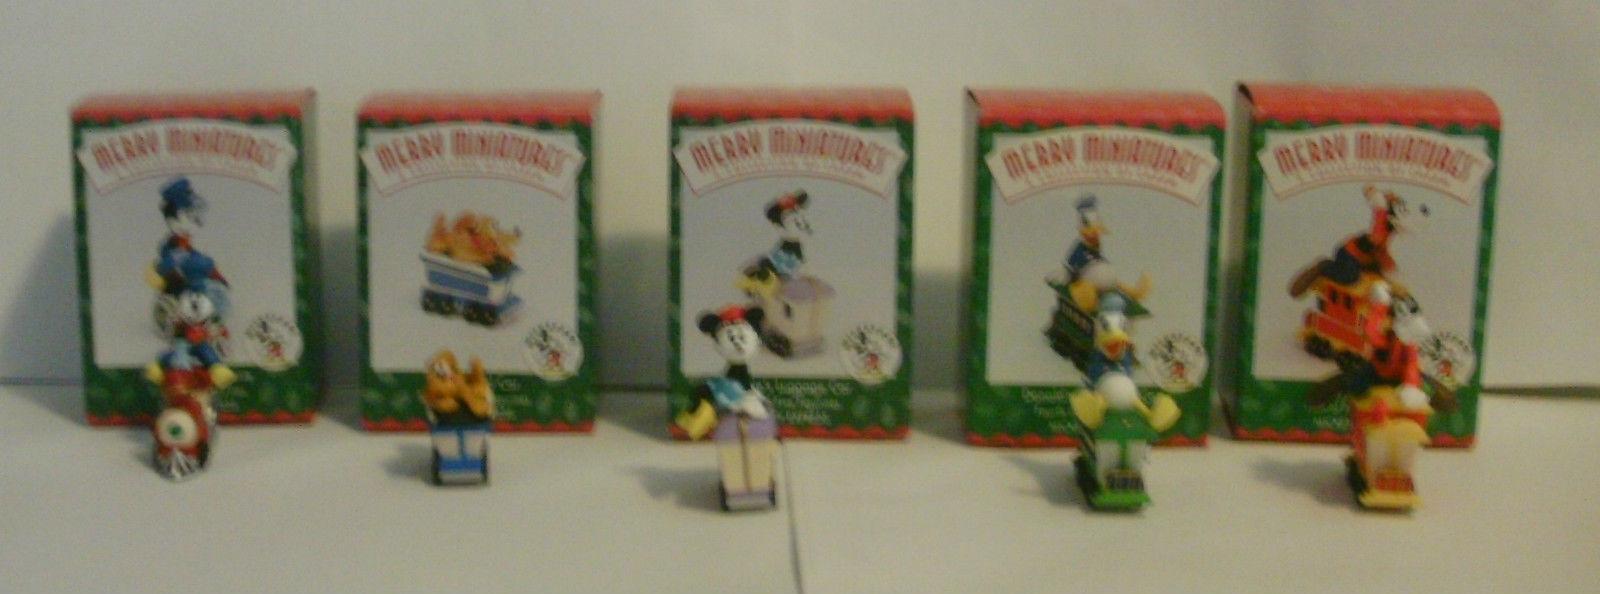 Disney Hallmark Merry Miniatures Mickey Express Train 1998 Complete Set of 5